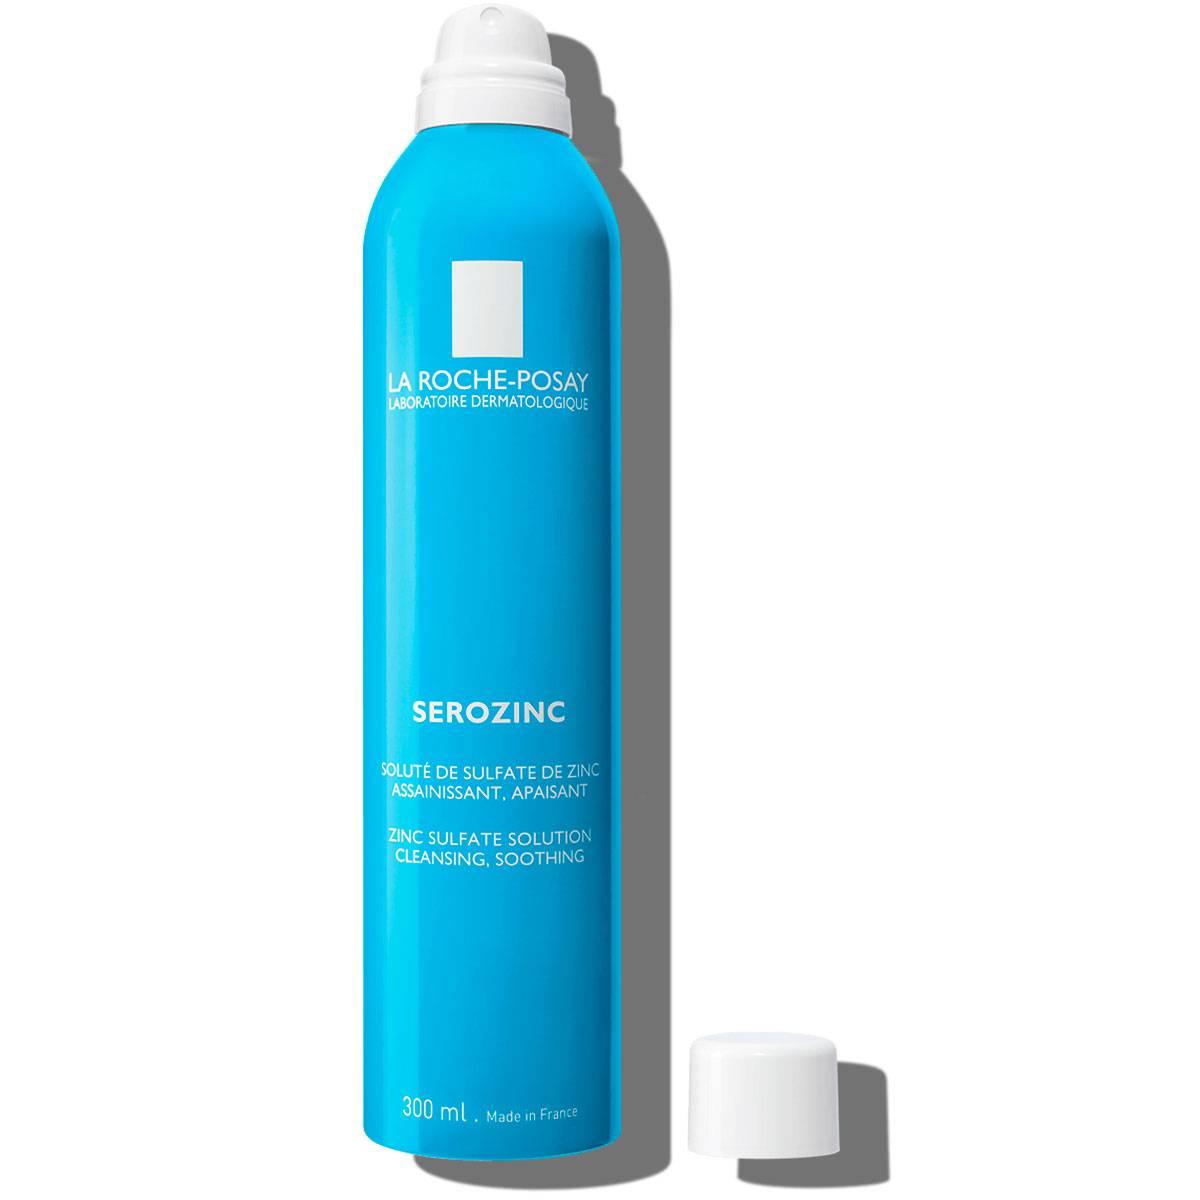 La Roche Posay Tuotesivu Serozinc Spray Zinc 300ml 3337875565783 Ope